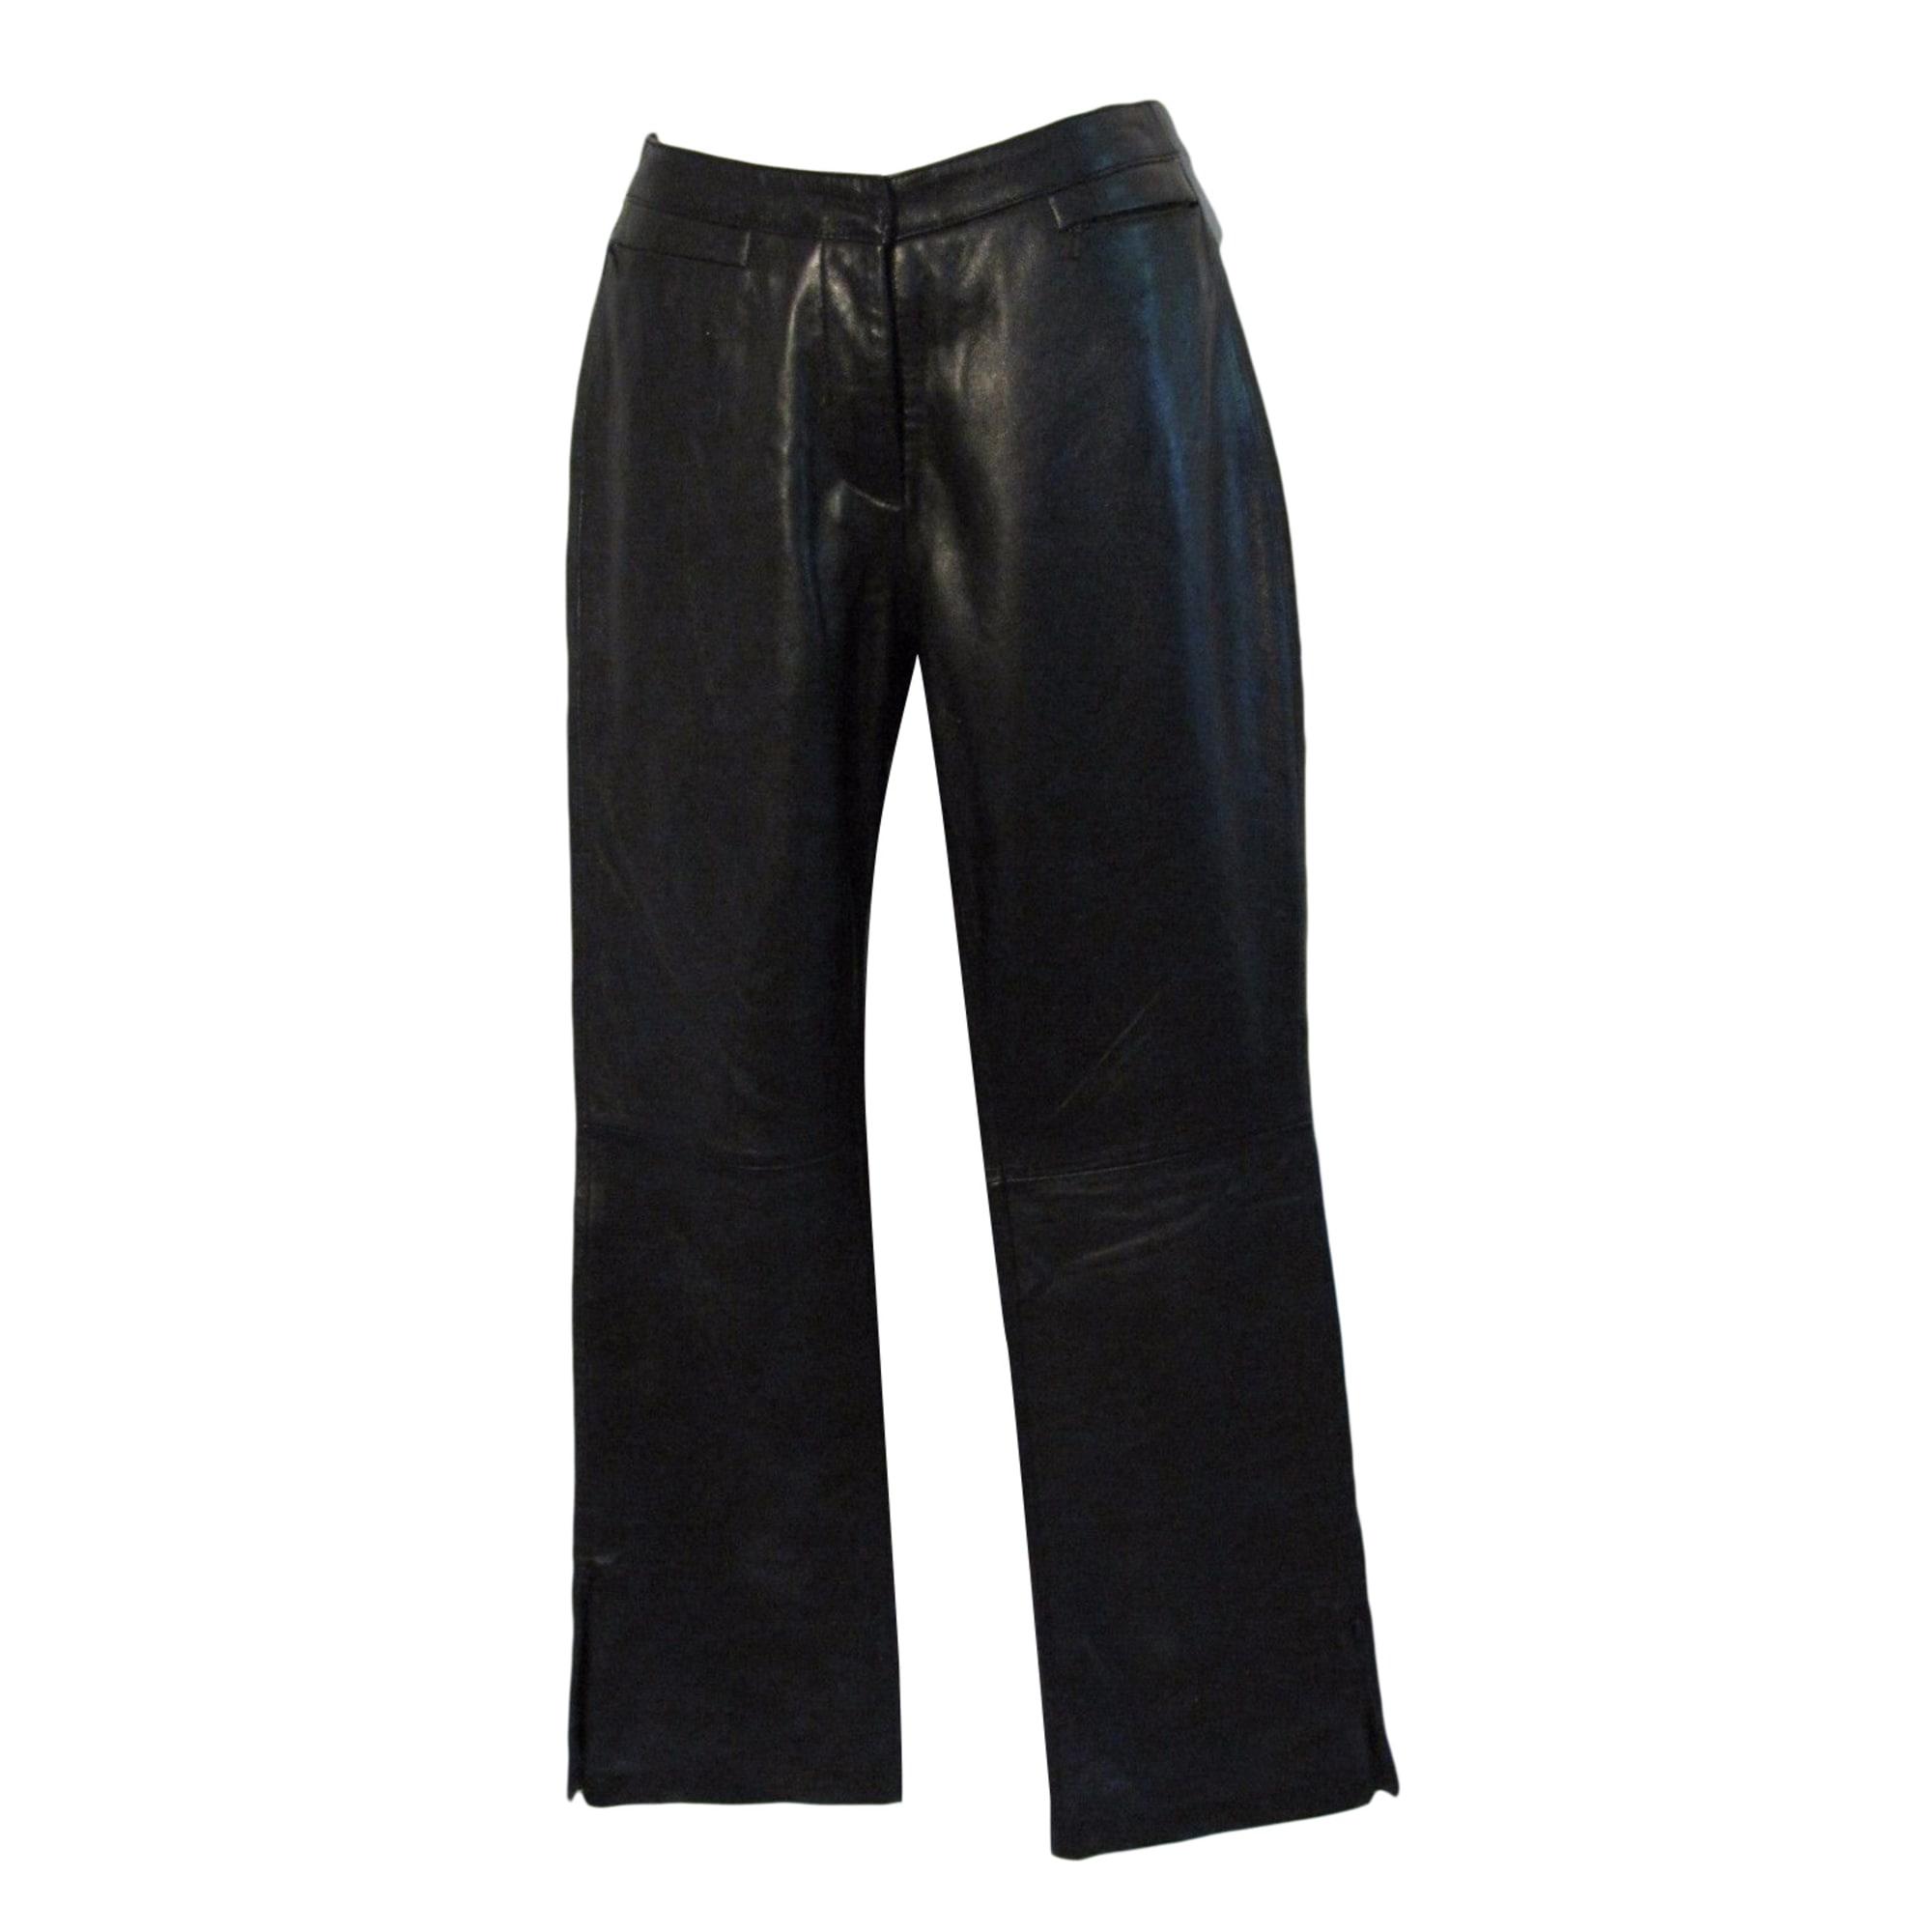 Pantalon slim, cigarette TOMMY HILFIGER Noir